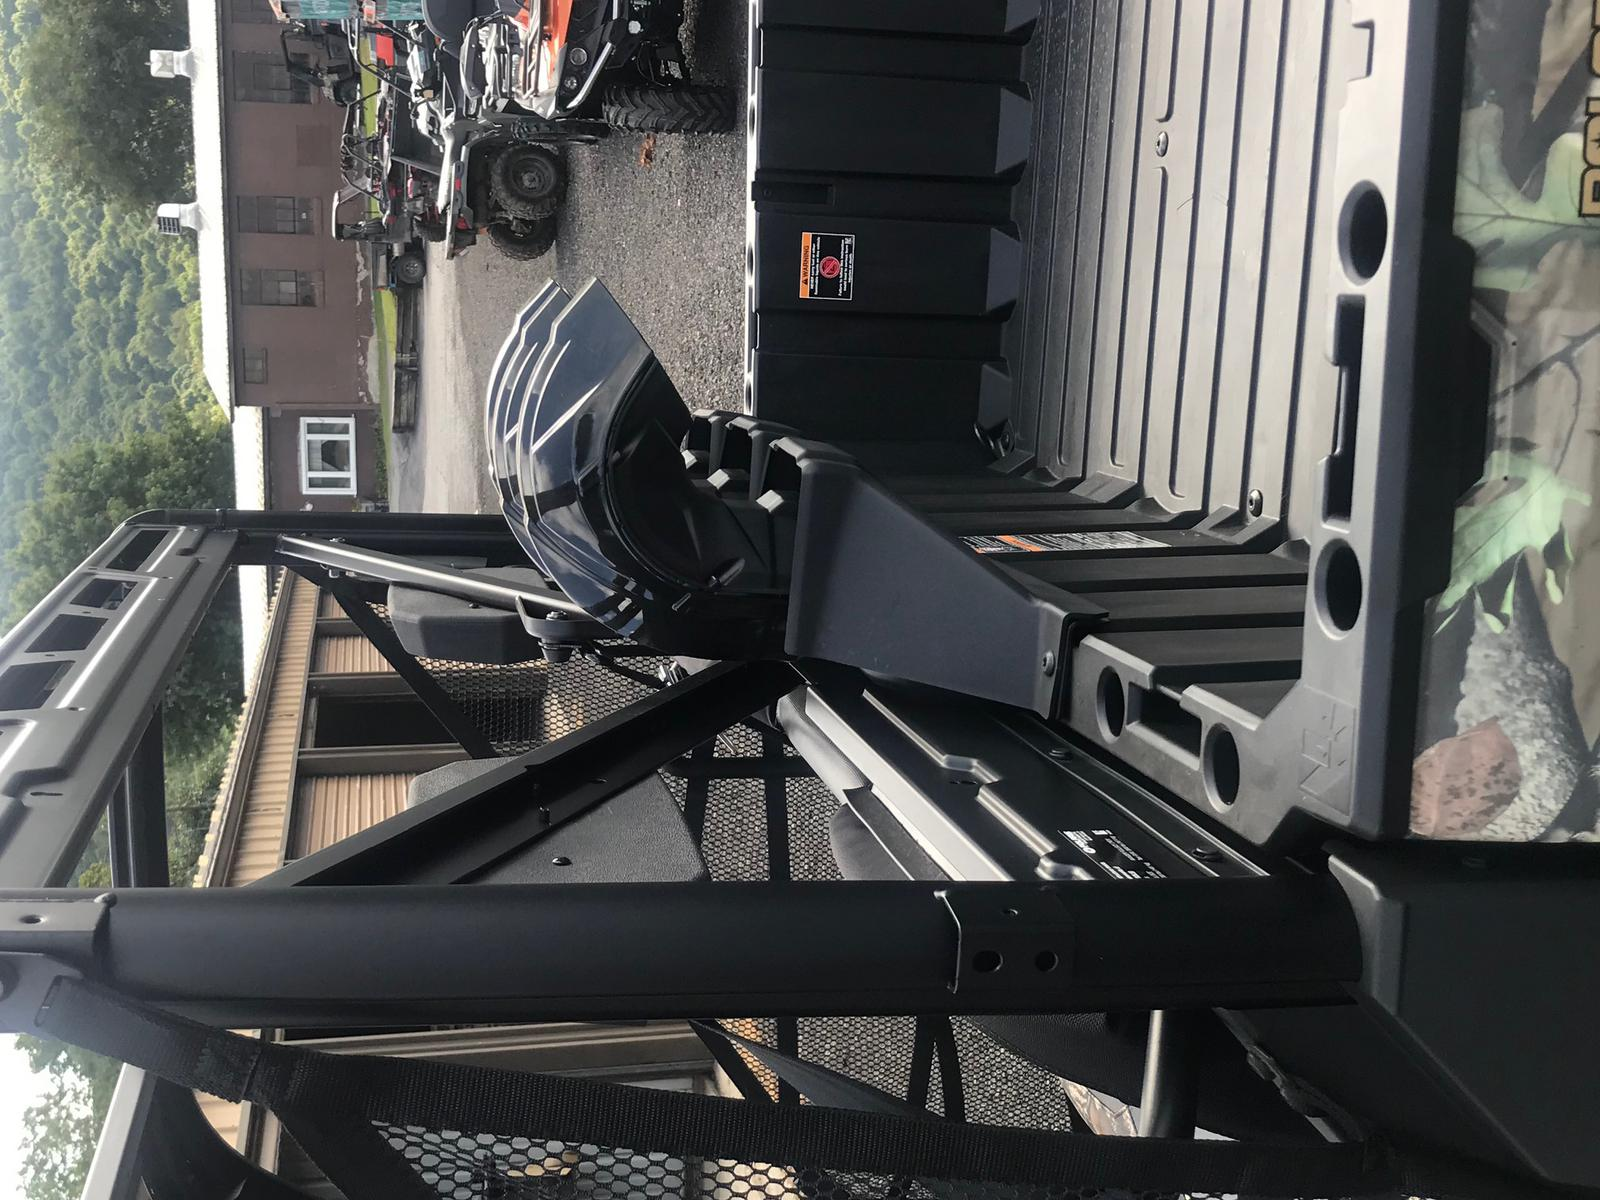 2019 Polaris Industries Ranger XP 1000 EPS Back Country